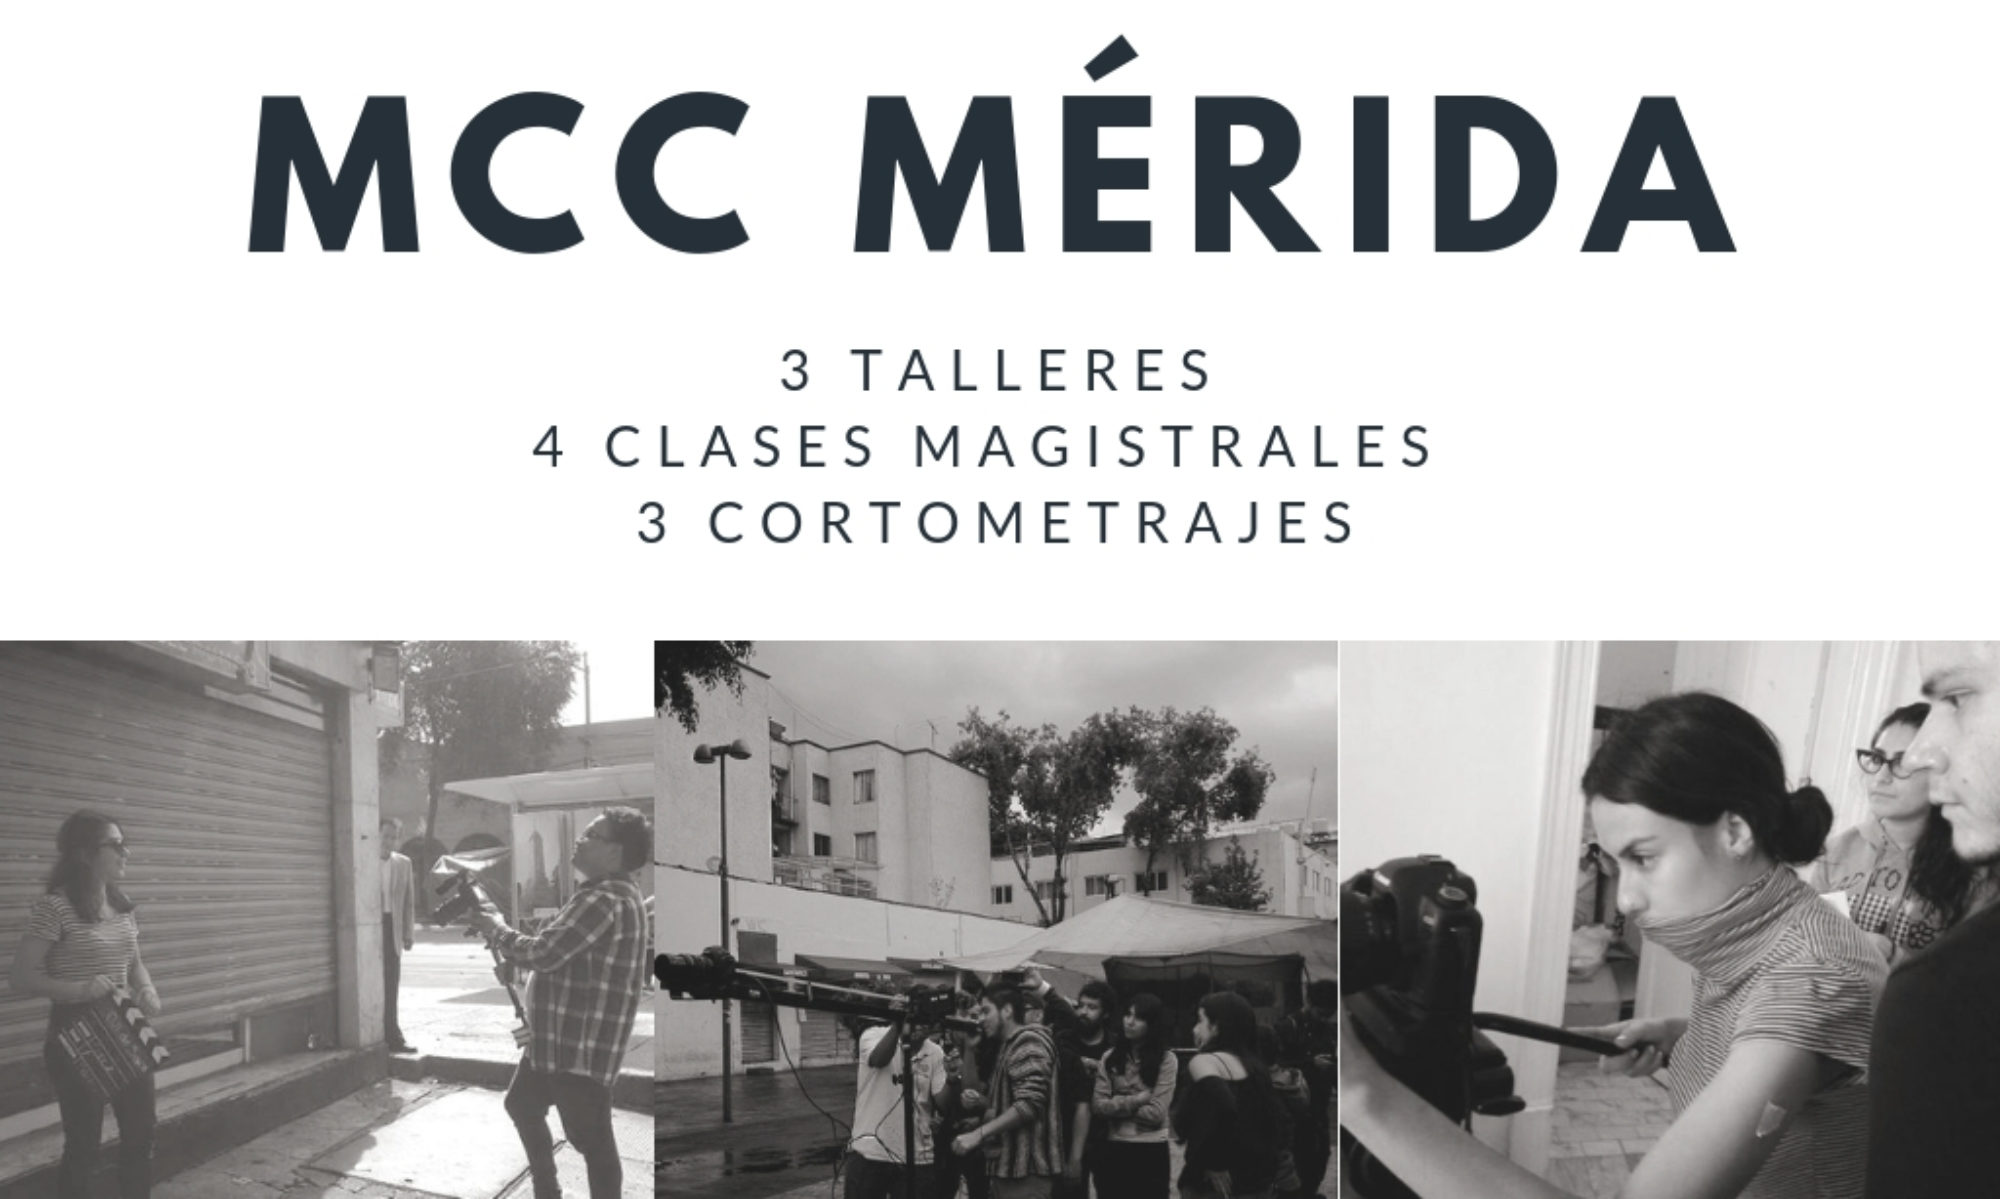 merida-muestra-cine-callejero-local-emergente